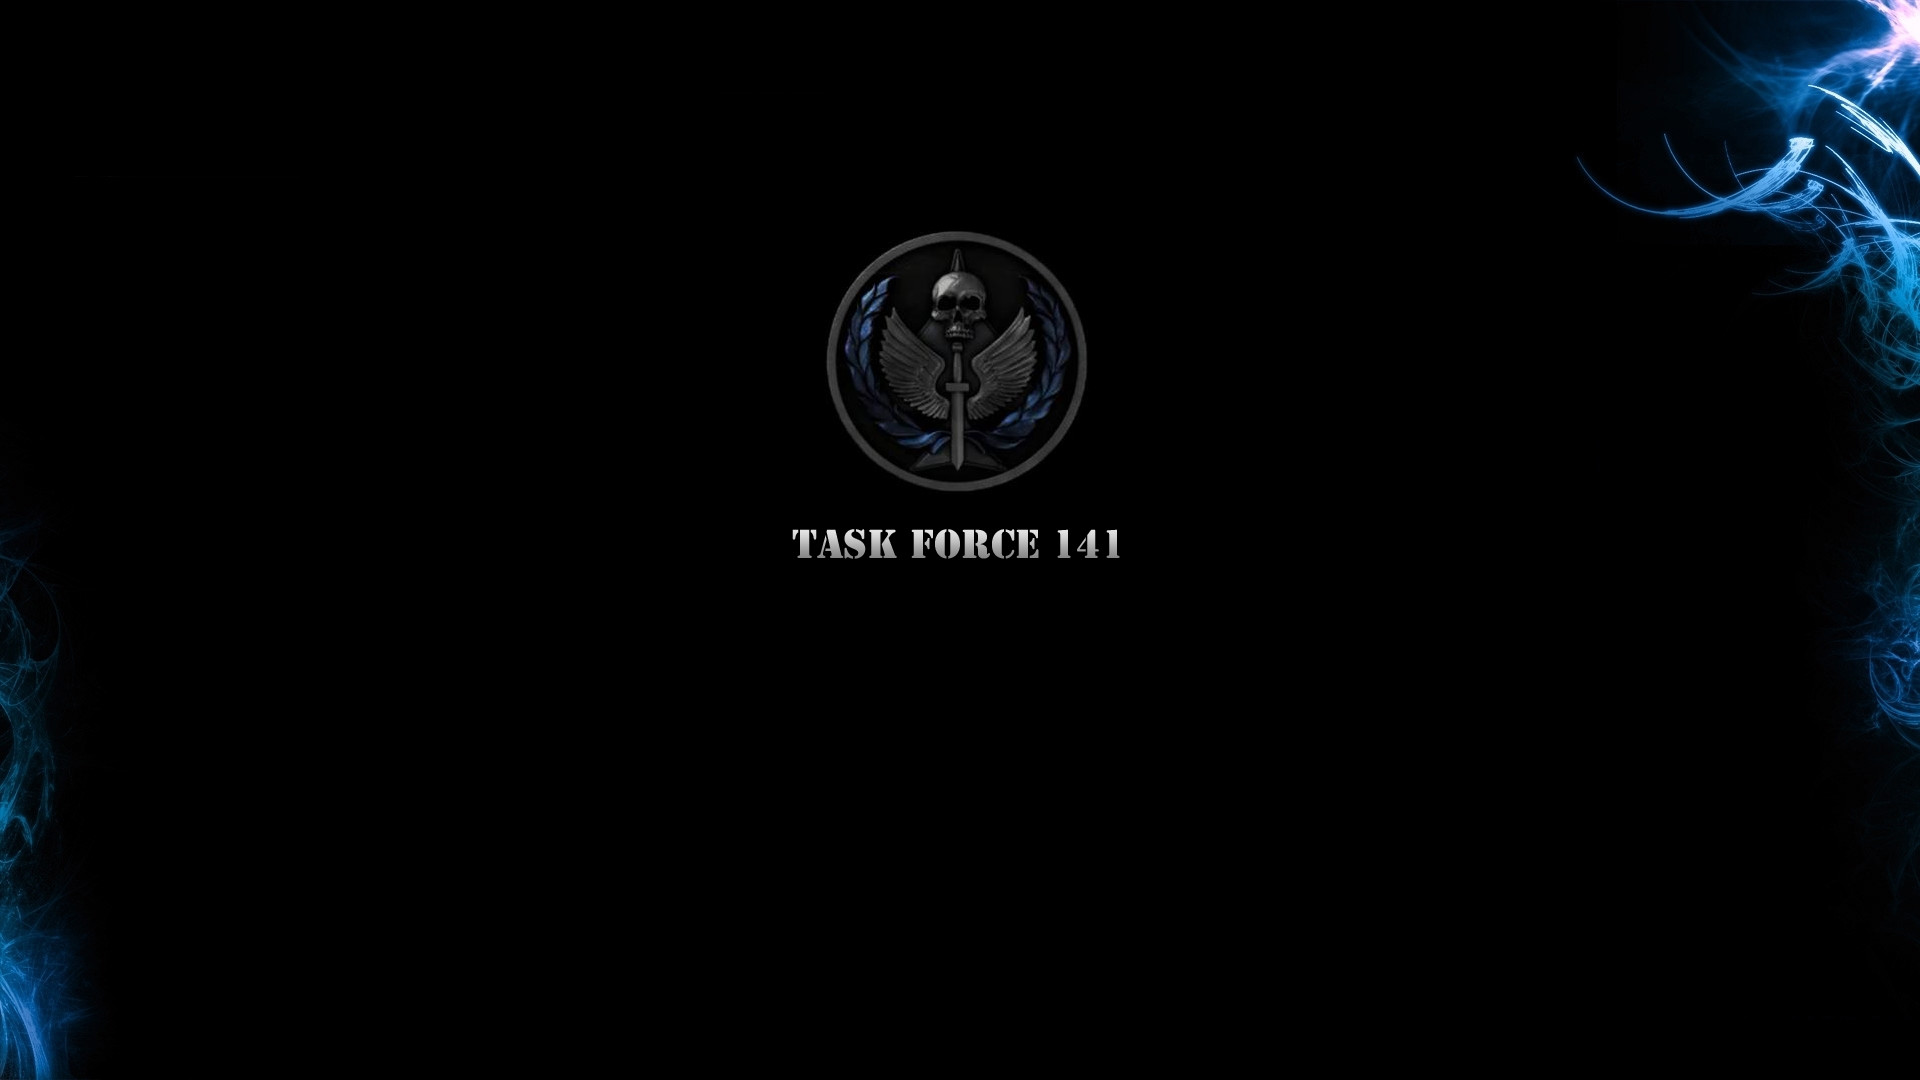 Task Force 141 Wallpaper